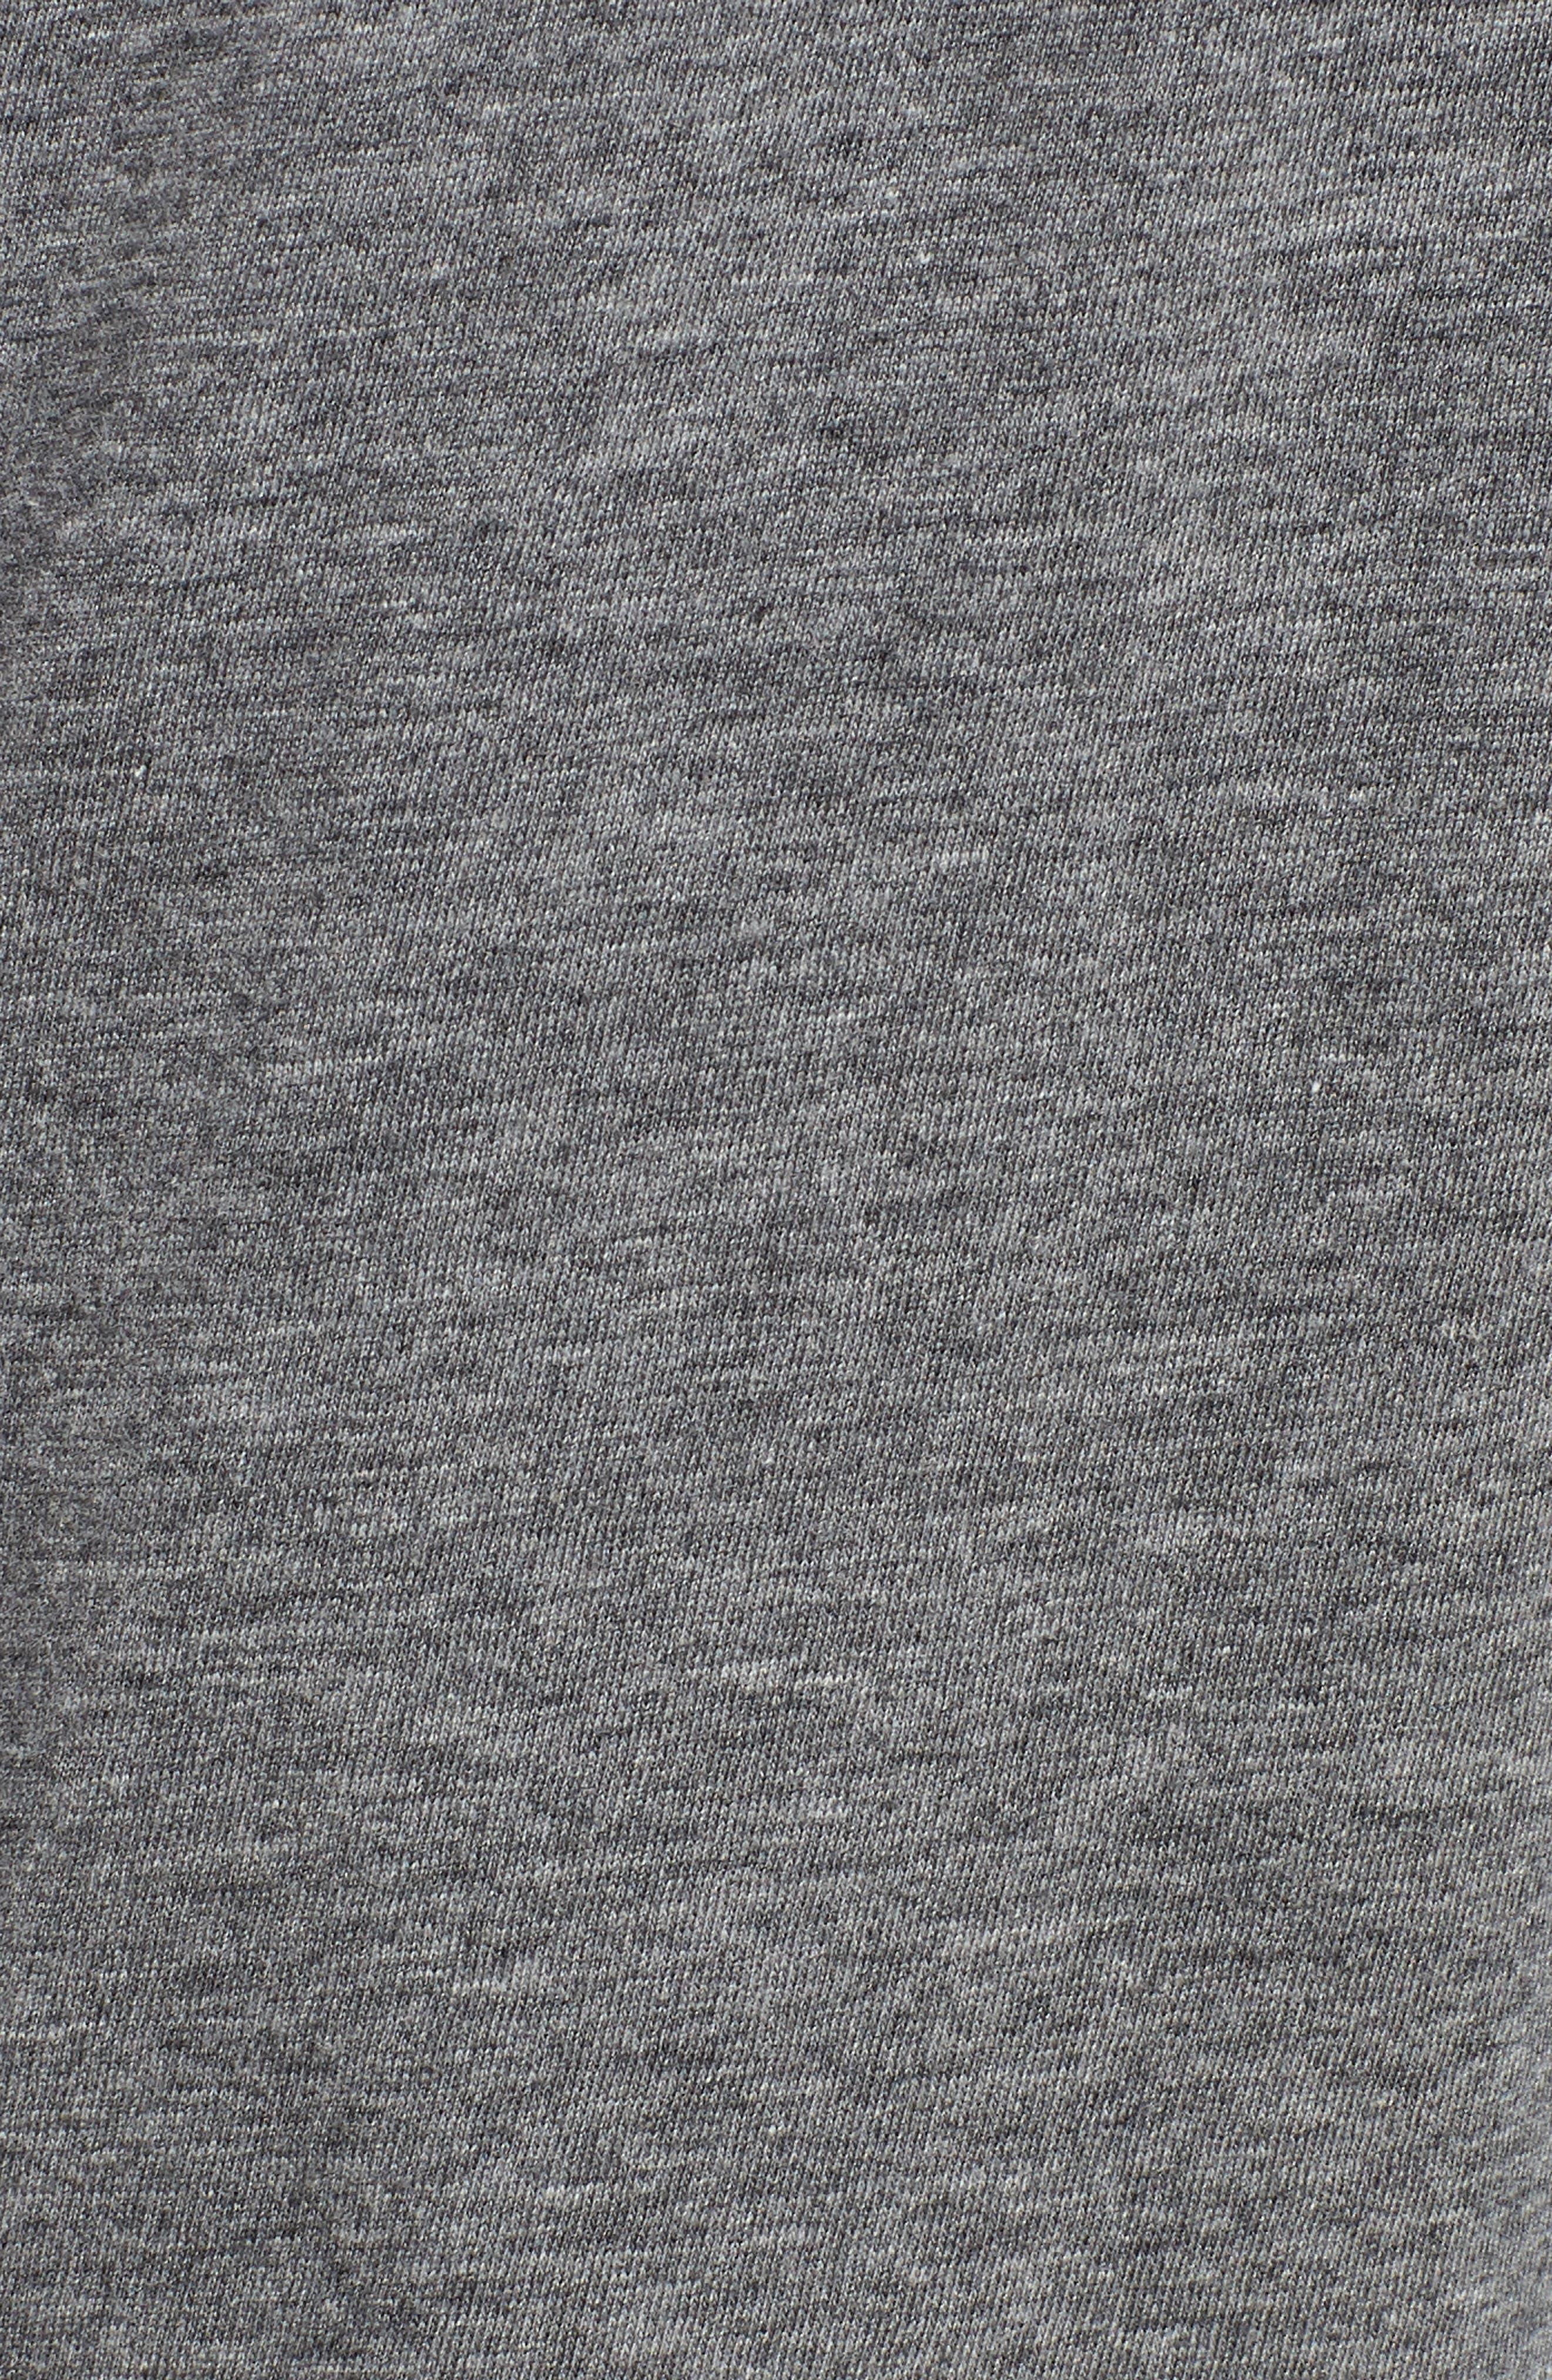 Peruvian Pima Cotton Lounge Shorts,                             Alternate thumbnail 5, color,                             031